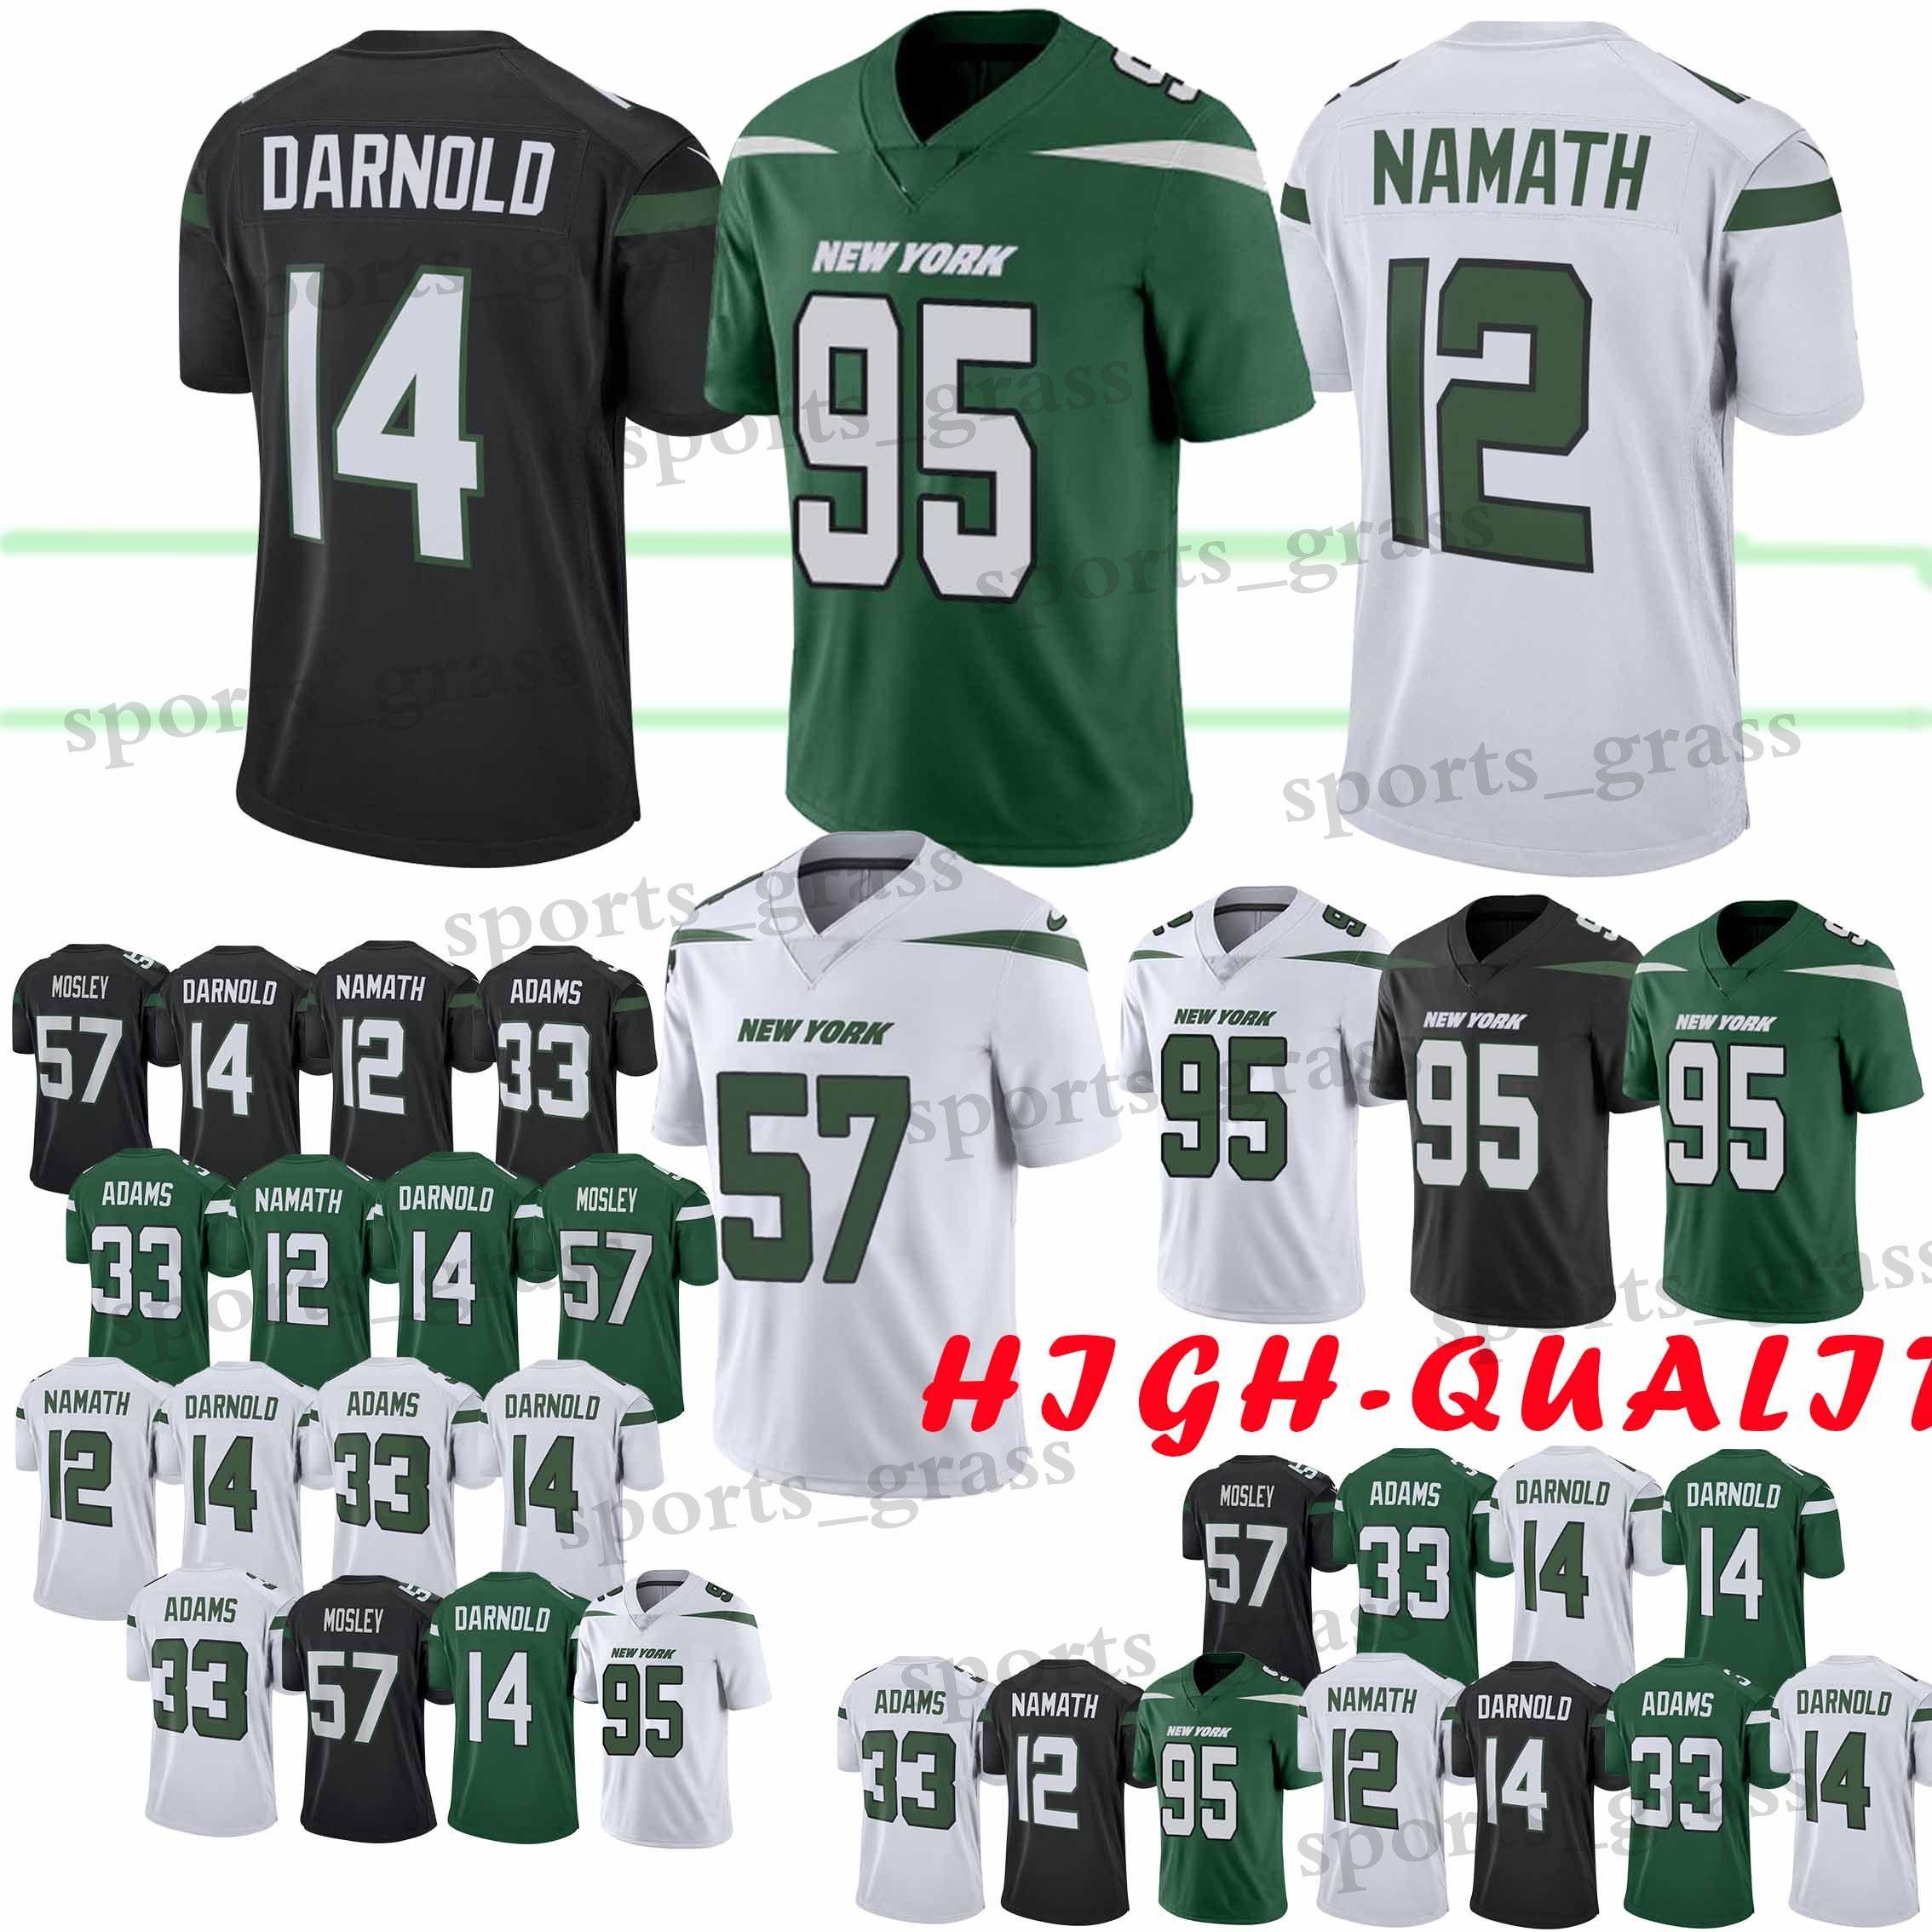 ad27fd664ac 2019 33 Jamal Adams 95 Quinnen Williams York Jets Jersey 26 Le'Veon Bell 14  Sam Darnold 12 Joe Namath Football Jerseys From Sports_grass, $26.95 |  DHgate.